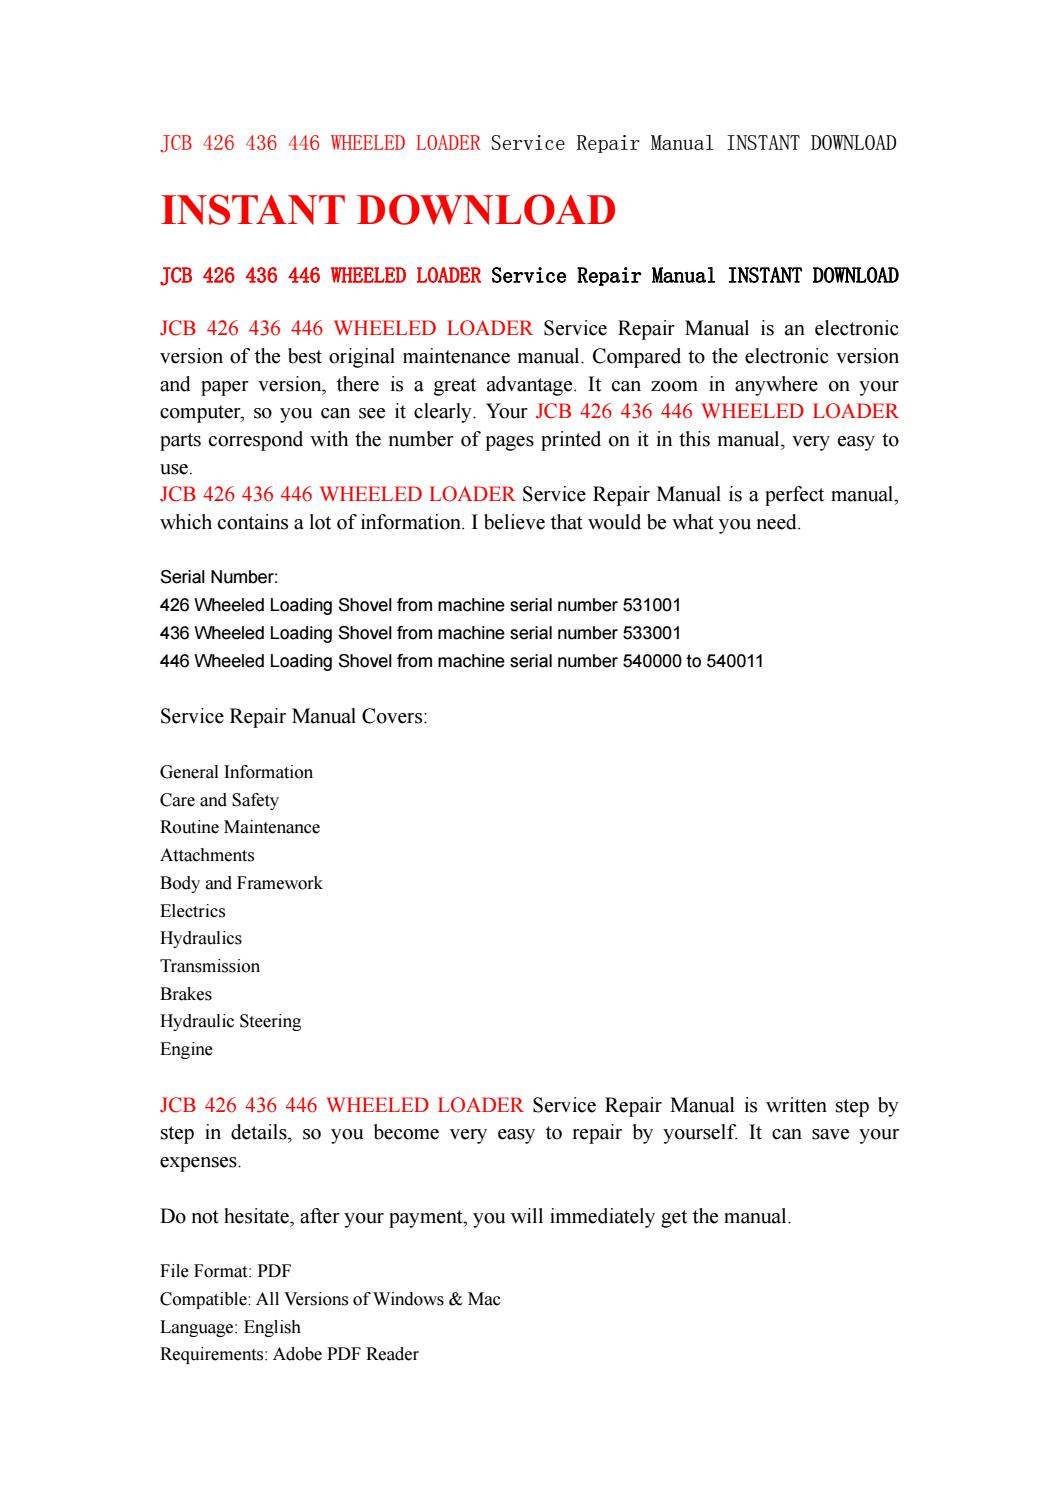 Jcb 426 436 446 wheeled loader service repair manual instant download by  kmfjnsuef7y - issuu